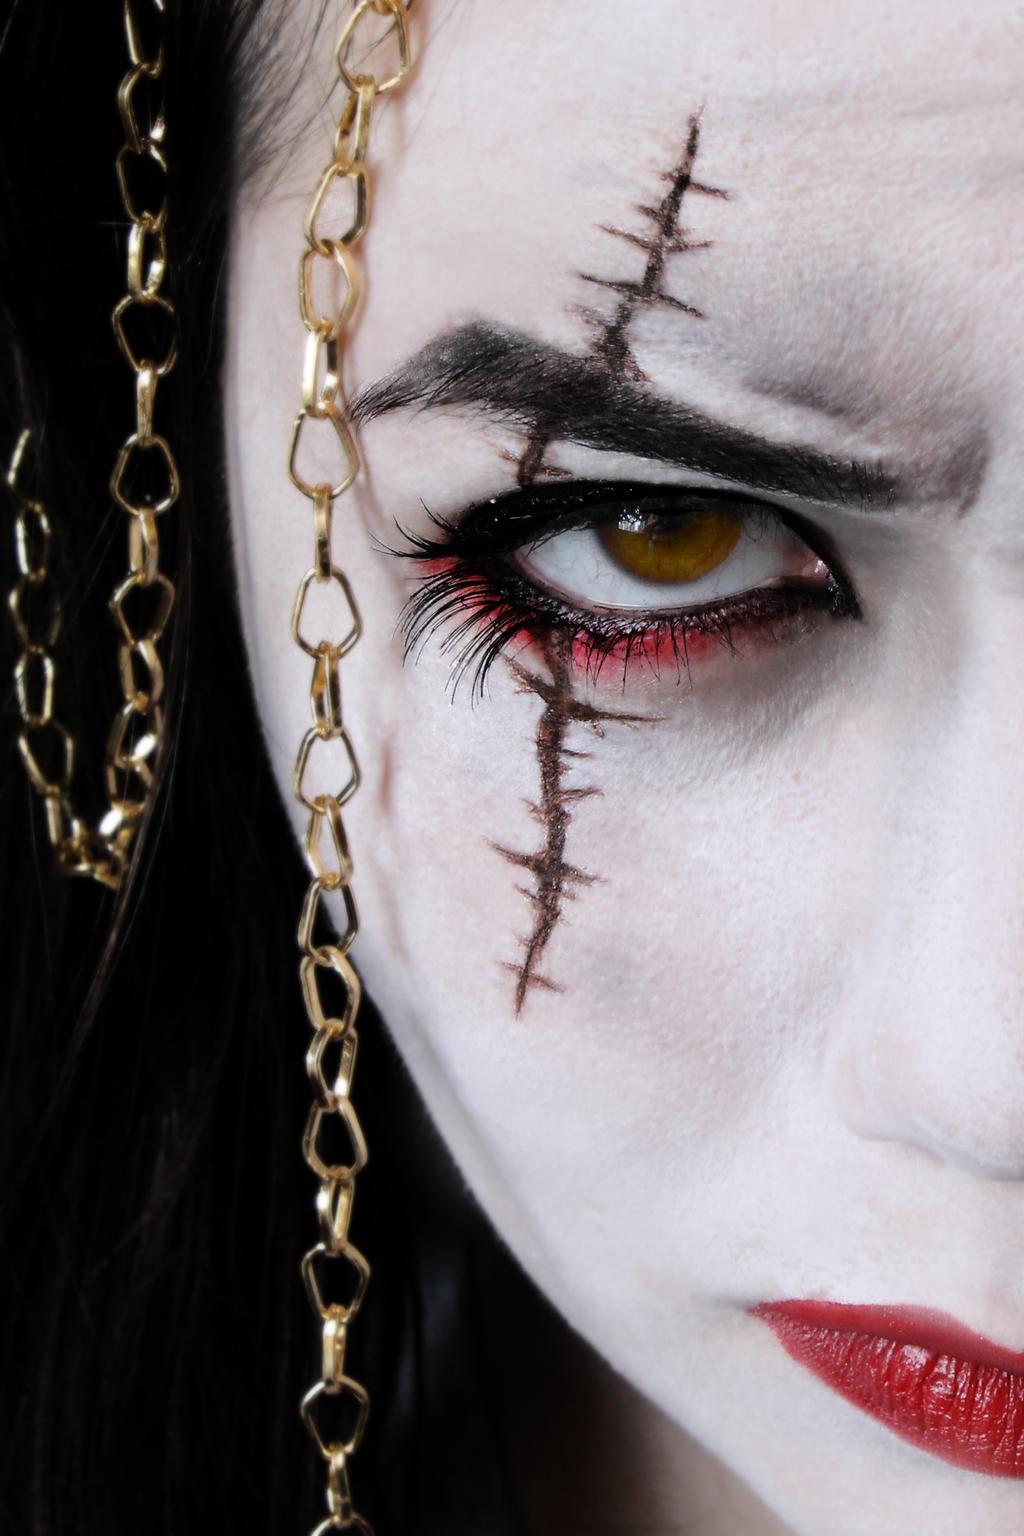 Как вести себя как вампир (девушки) - wikiHow 781